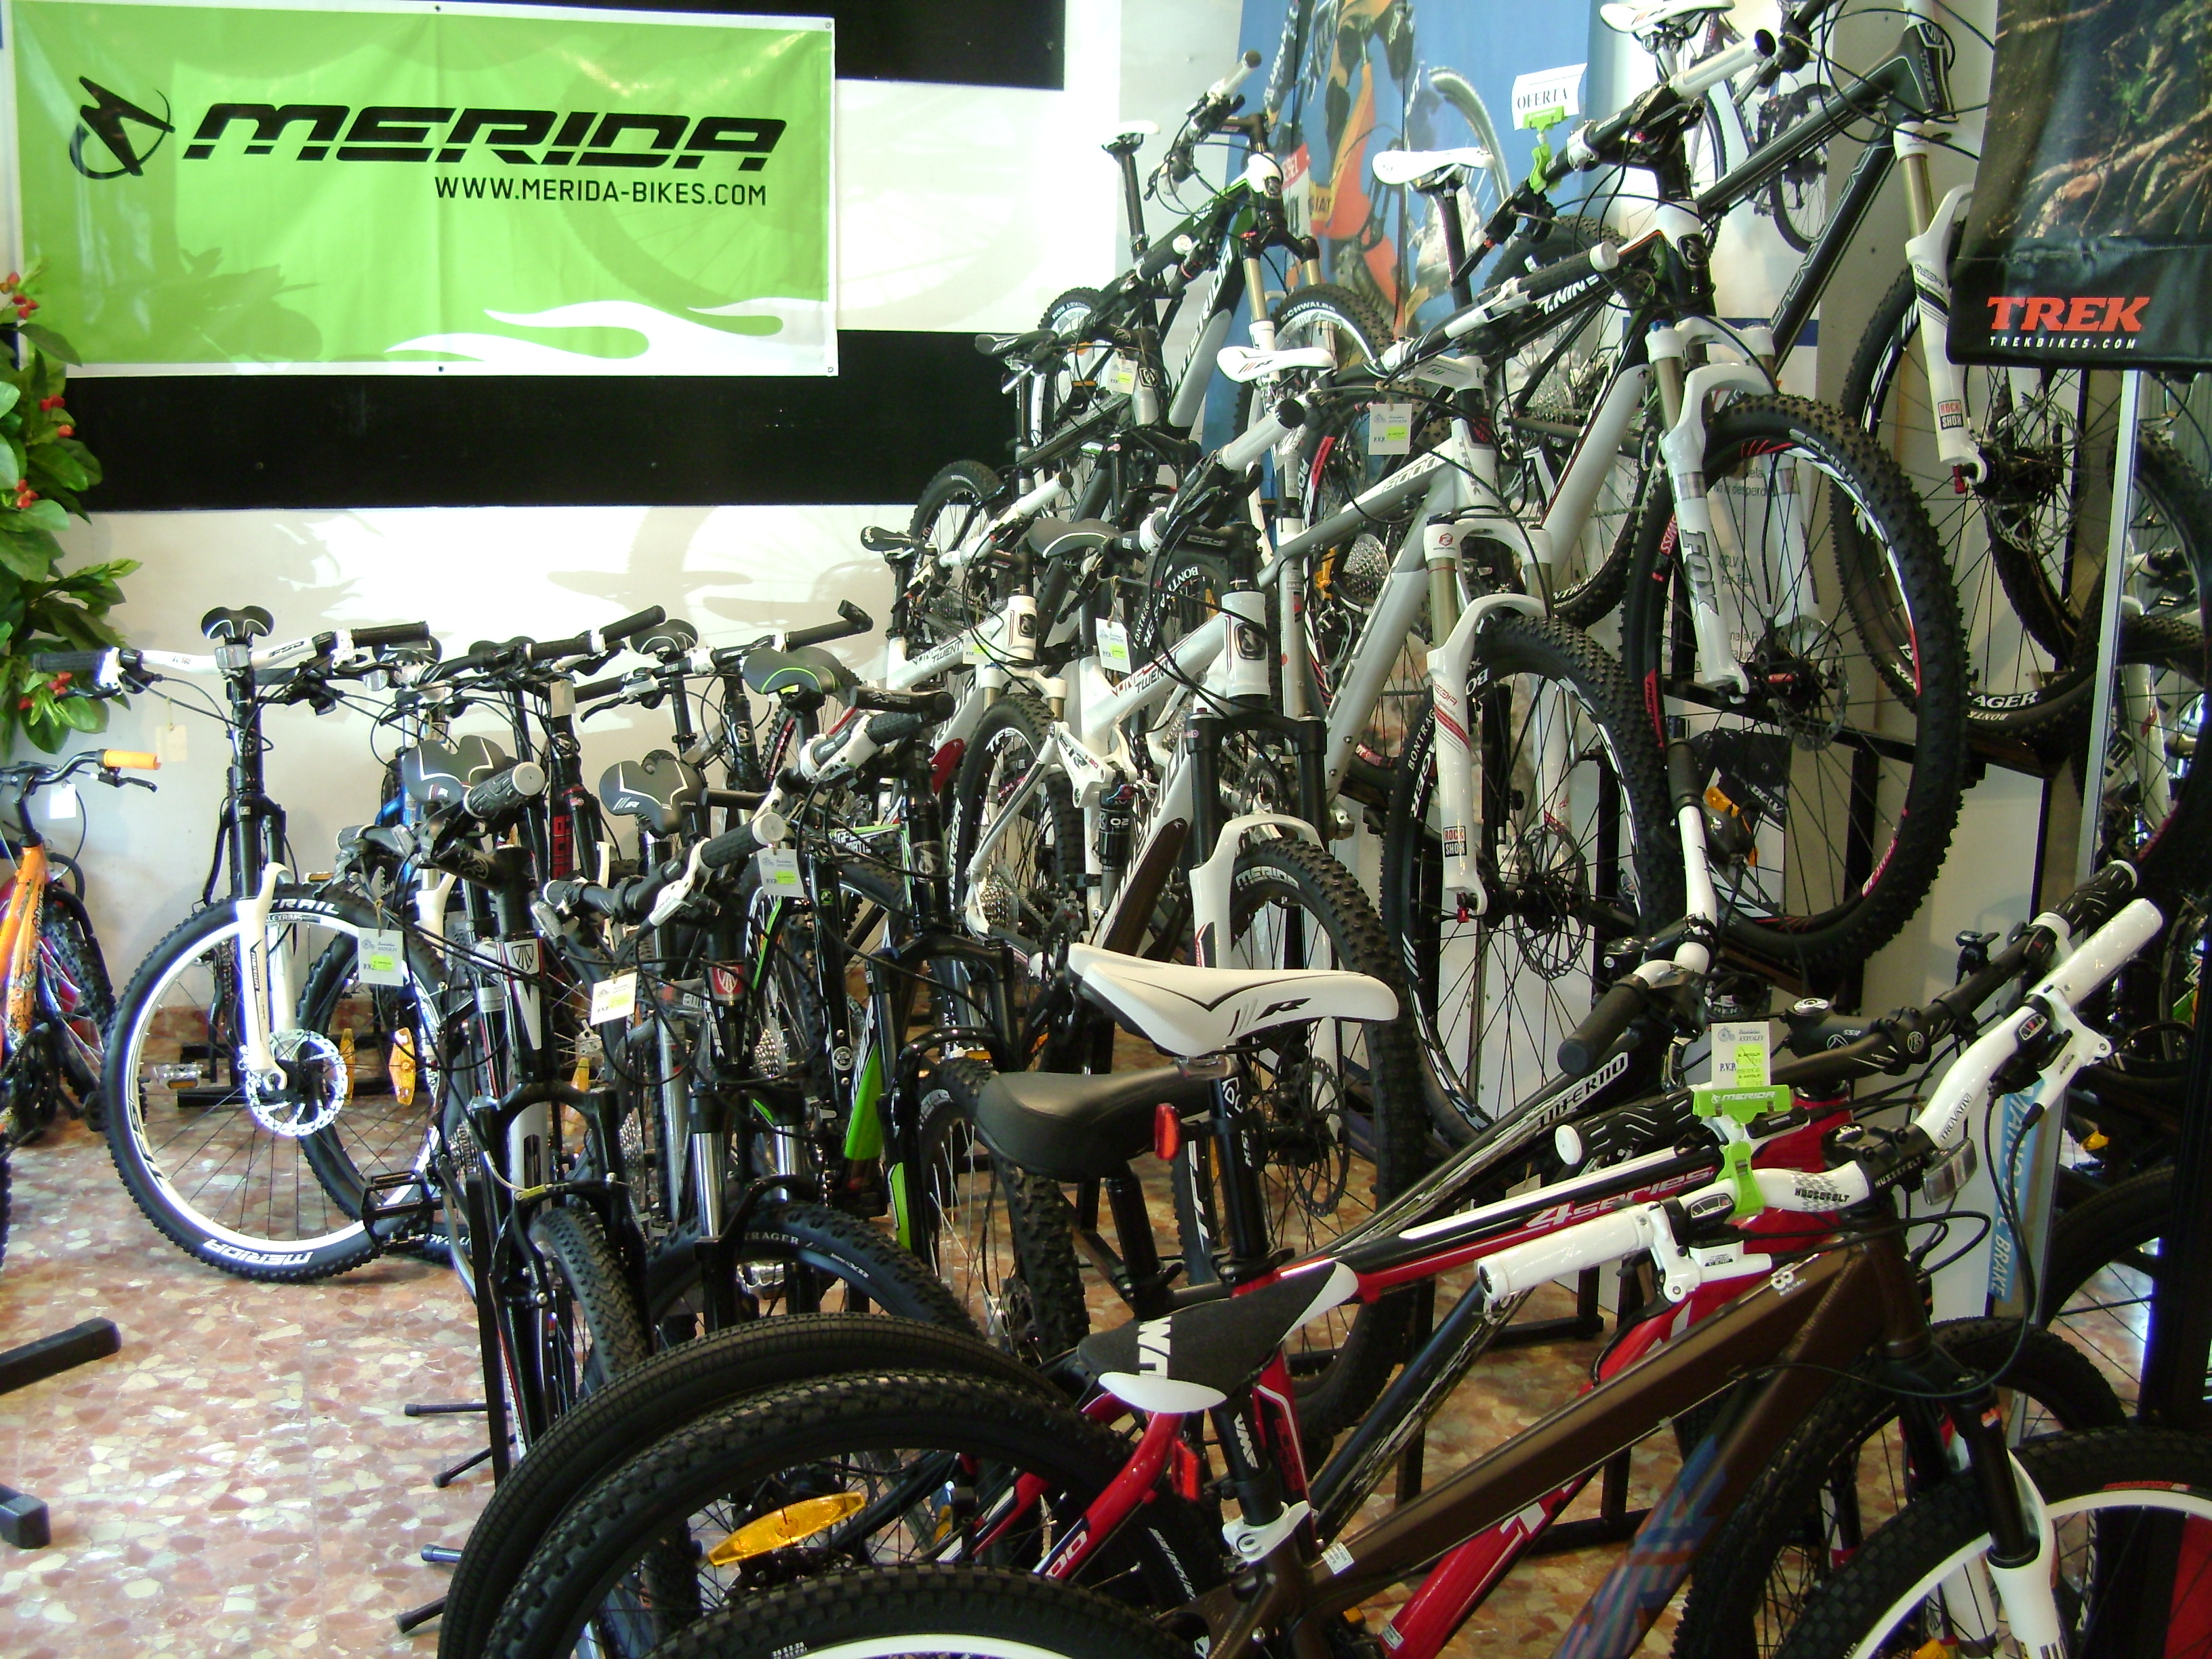 Bicicletas Astolfi S.L.